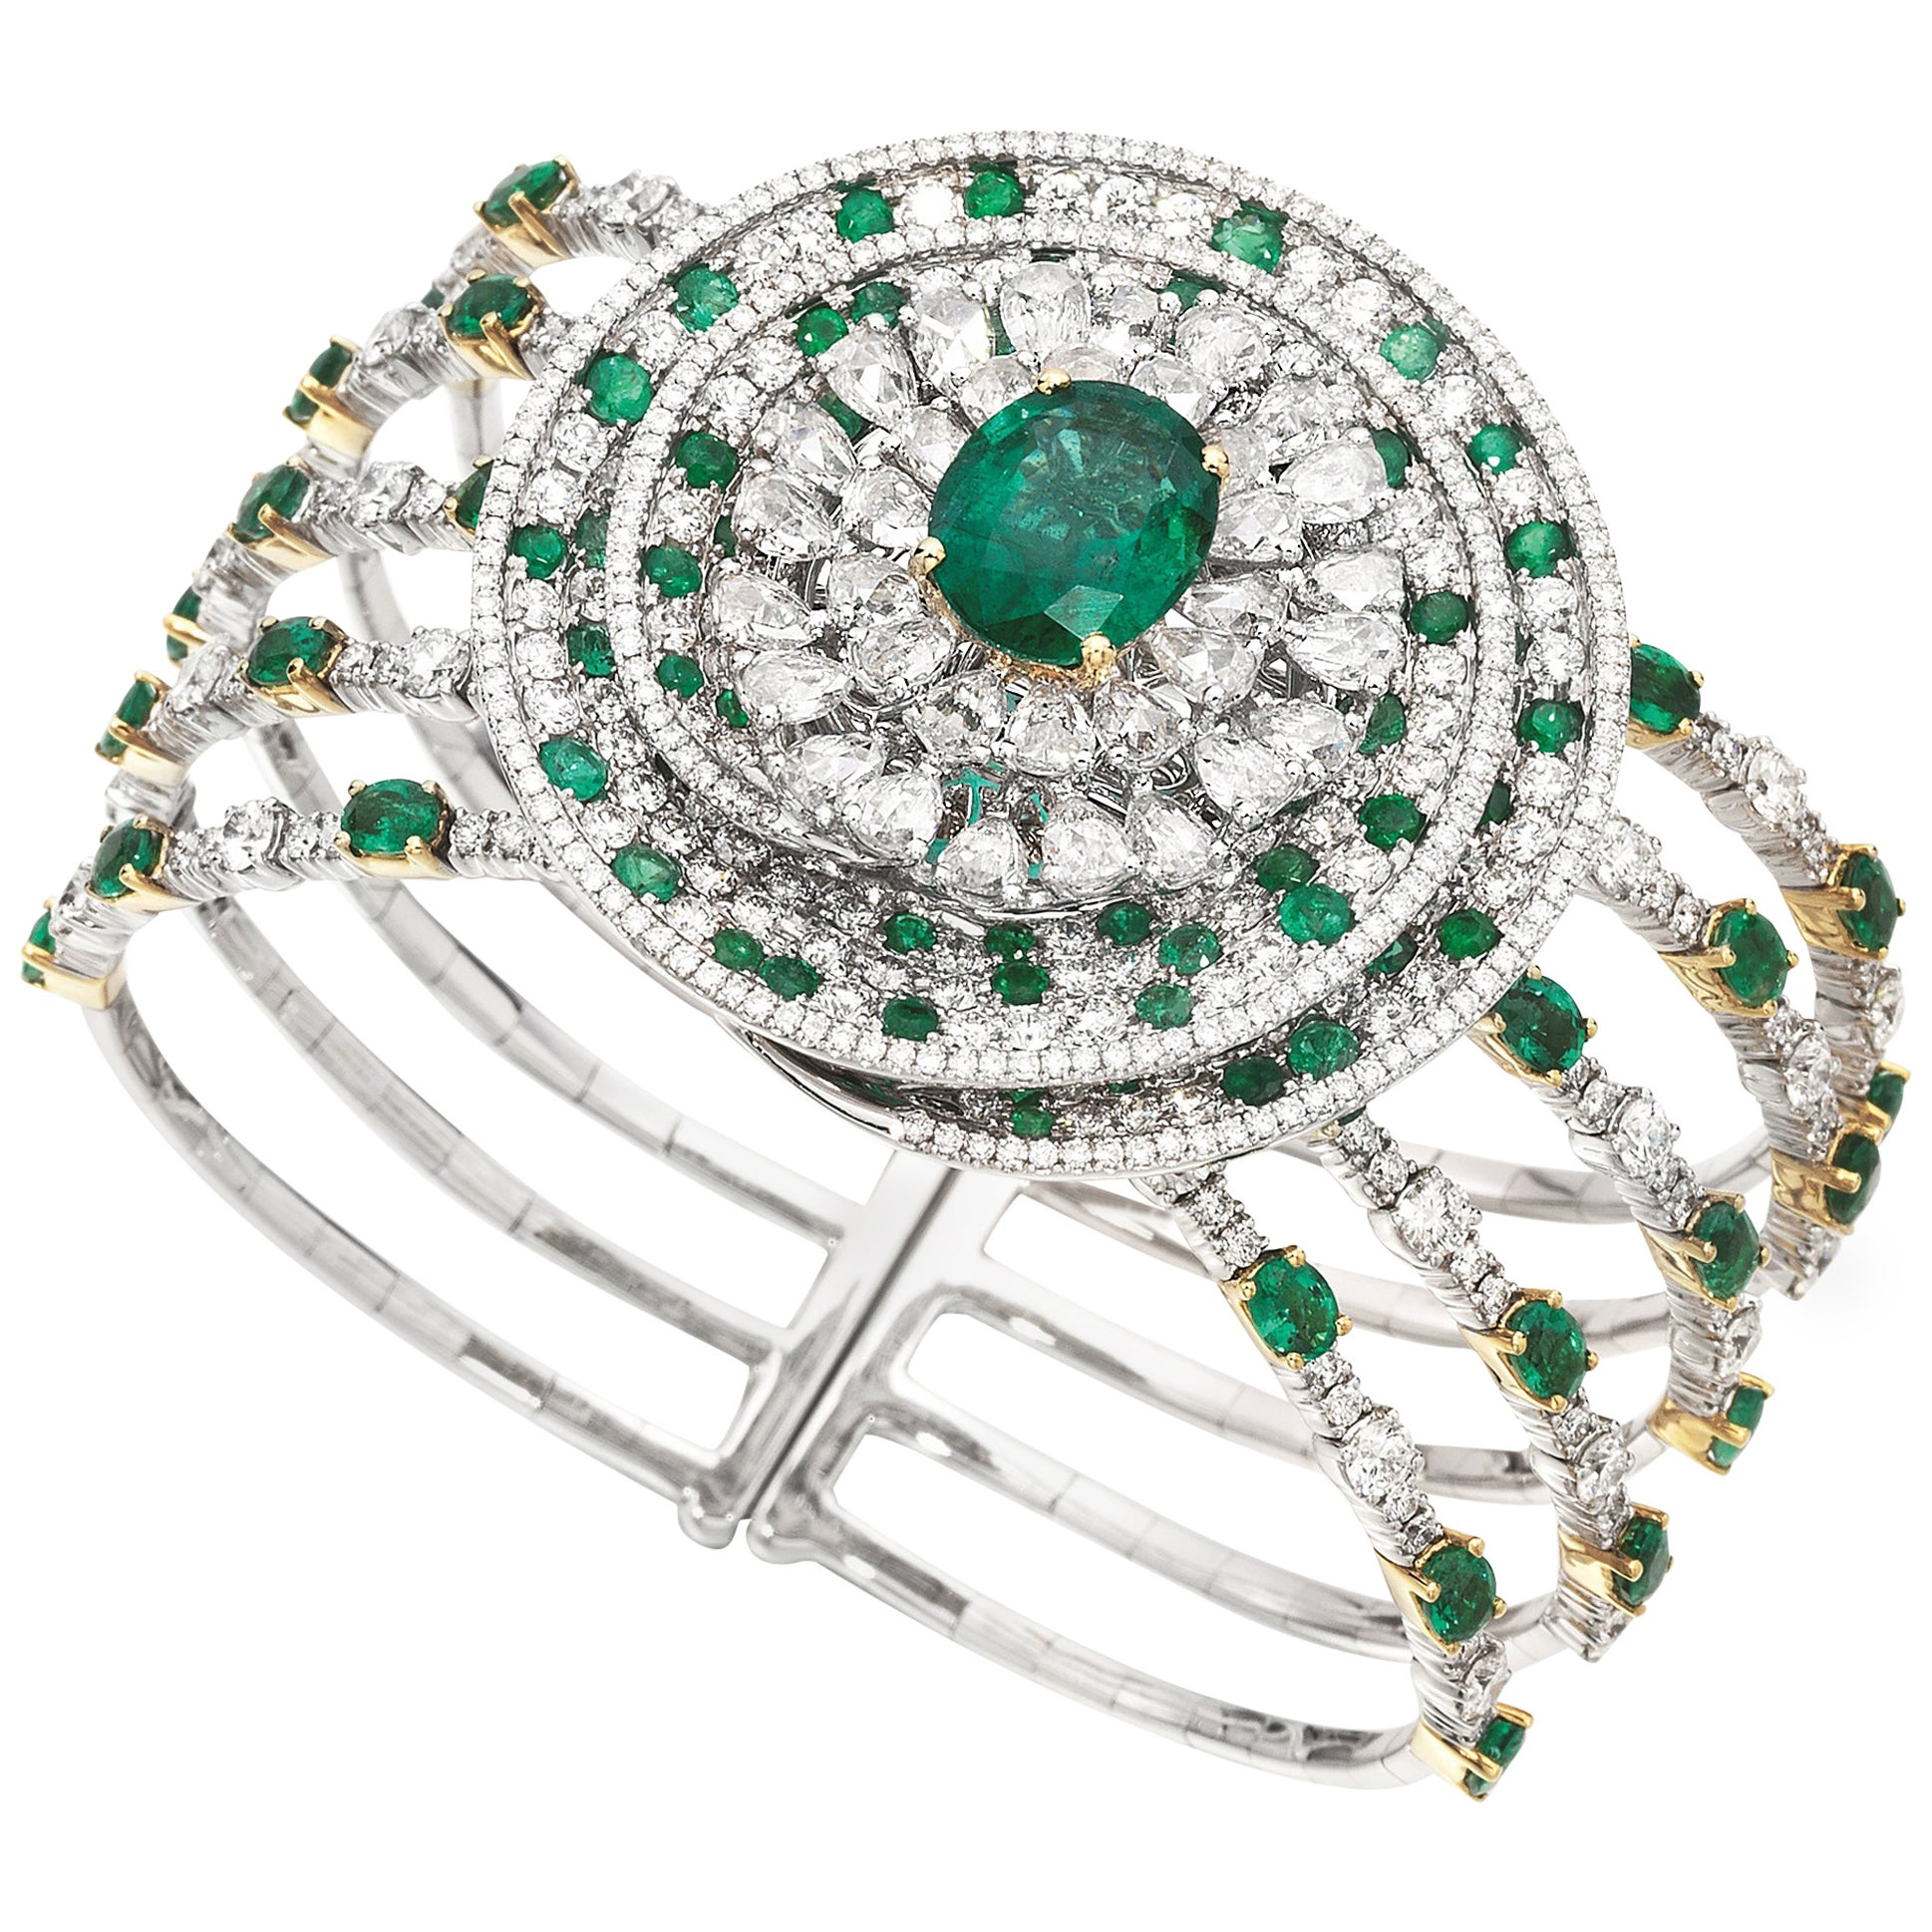 3.86 Carat Oval Emerald Diamond 18 Karat White Yellow Gold Cuff Bangle Brooch